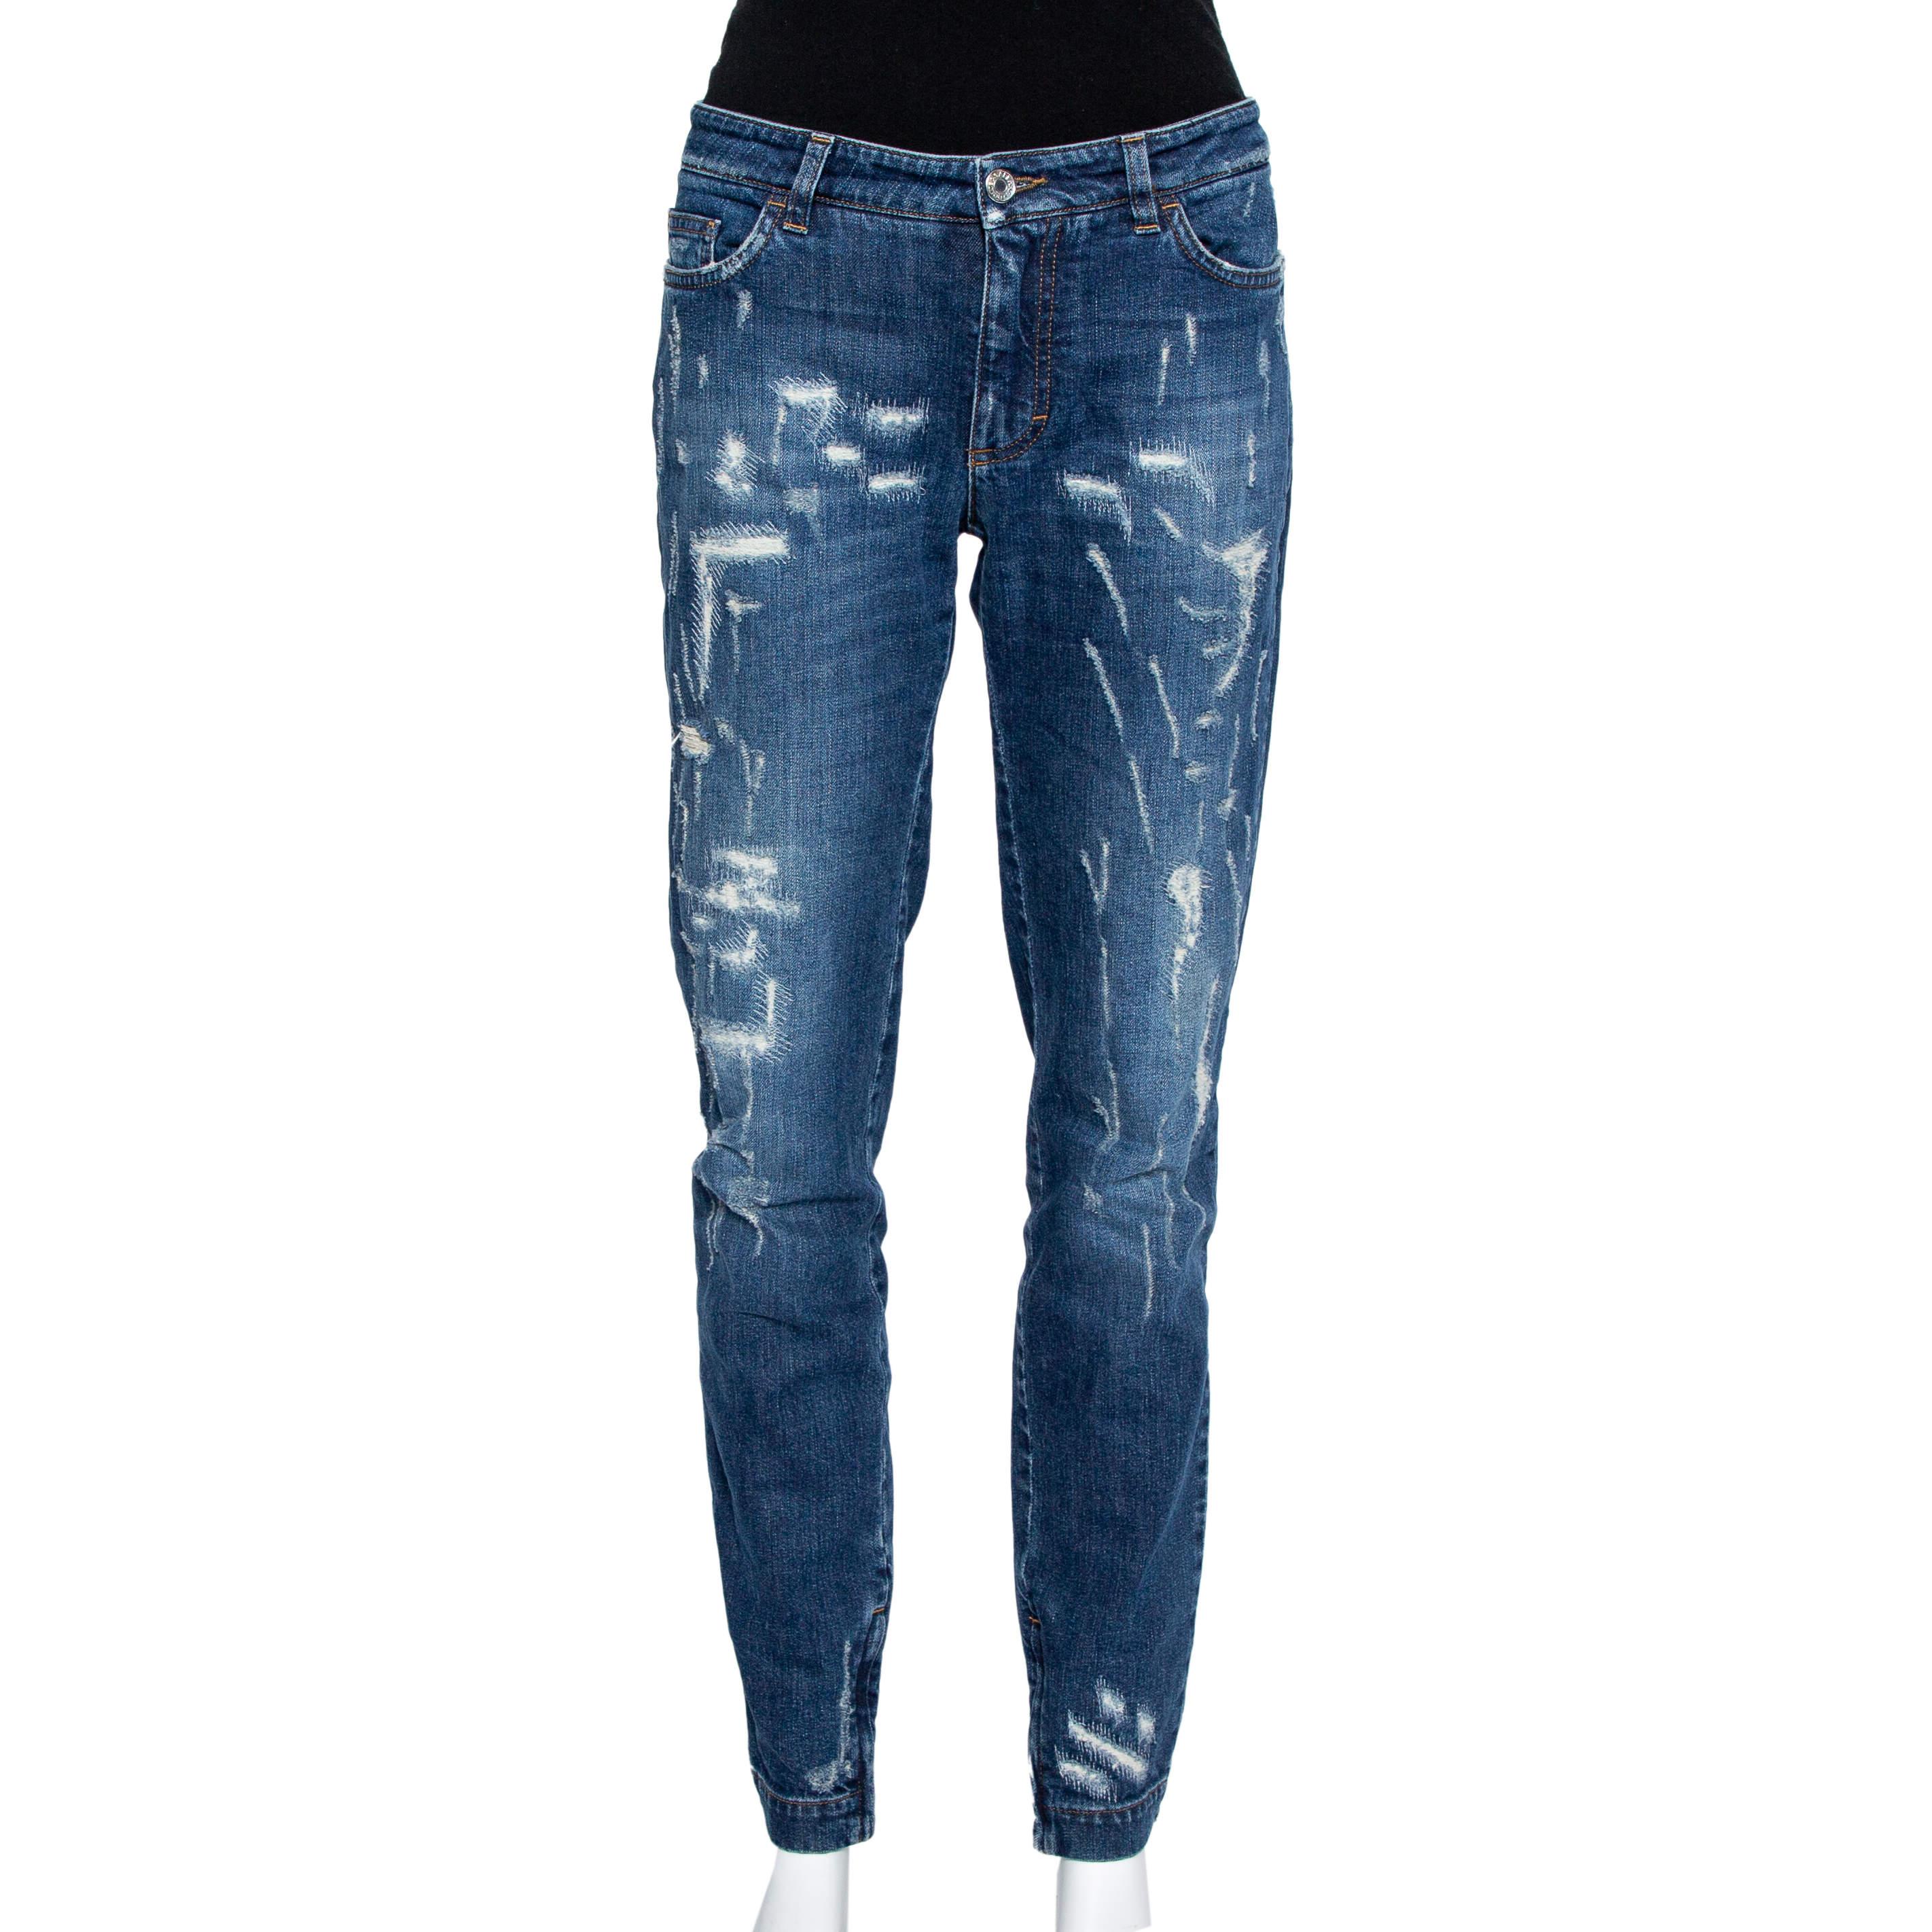 Dolce & Gabbana Navy Blue Denim Distressed Zip Detail Pretty Jeans L